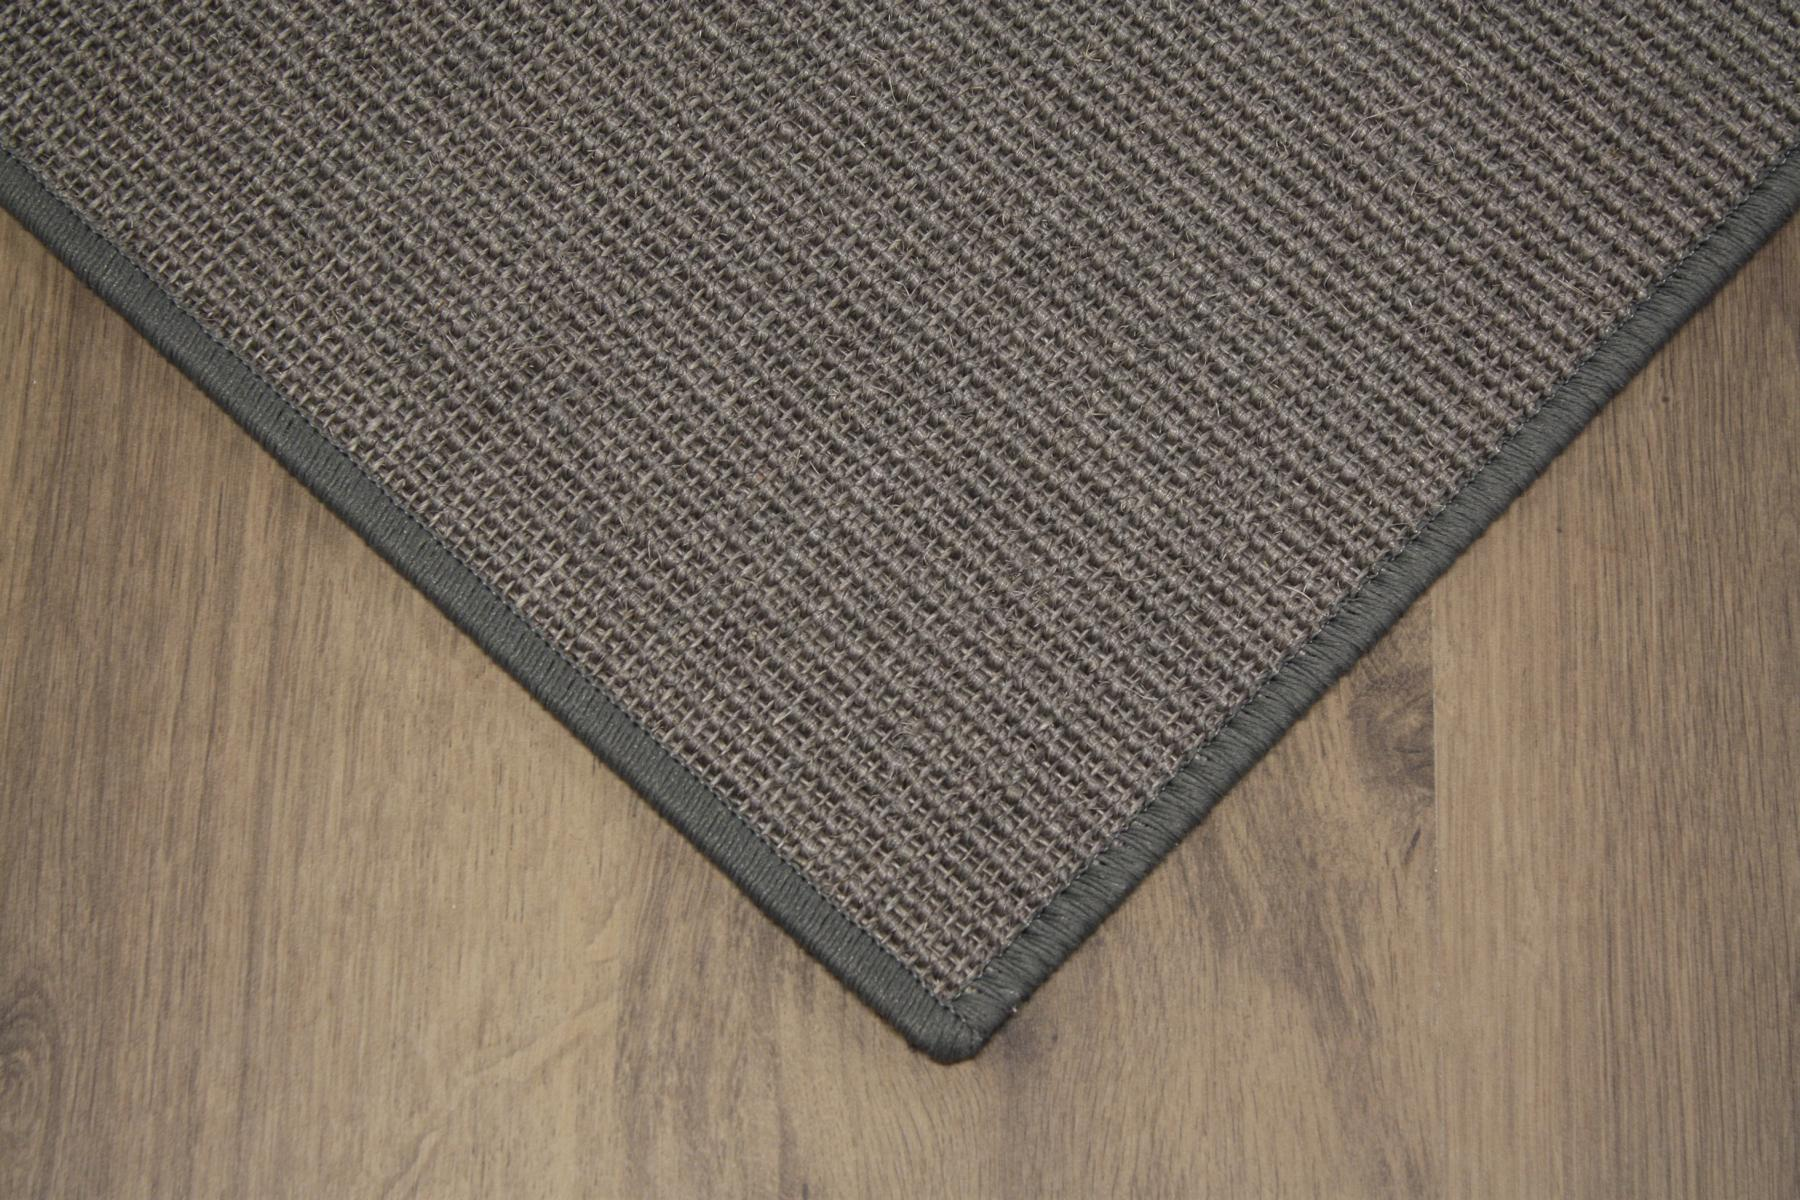 sisal katzen kratzmatte kratzbrett 60x80cm grau 100 sisal gekettelt ebay. Black Bedroom Furniture Sets. Home Design Ideas